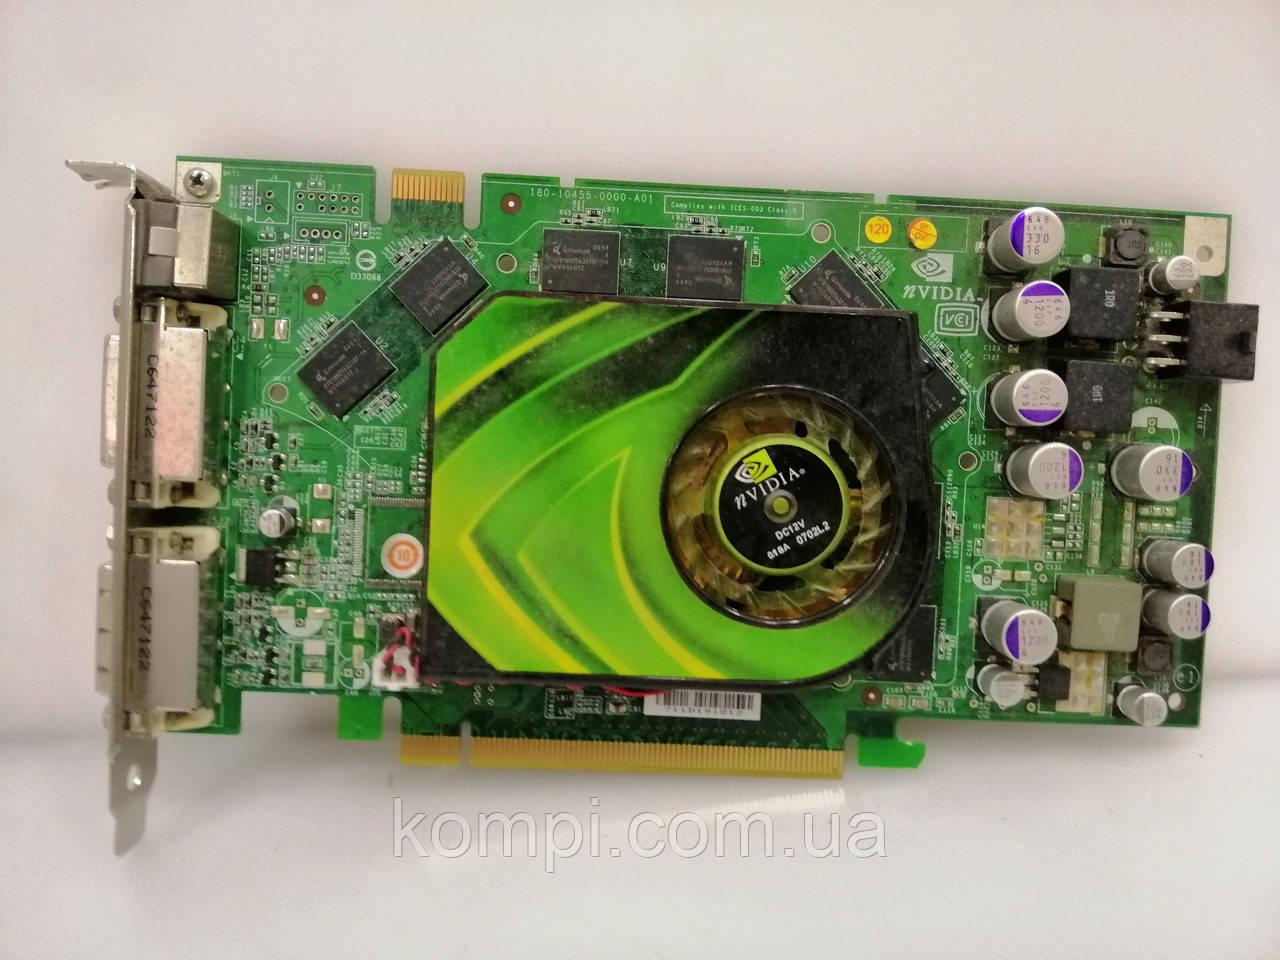 Видеокарта NVIDIA  Quadro FX3500 256MB  PCI-E